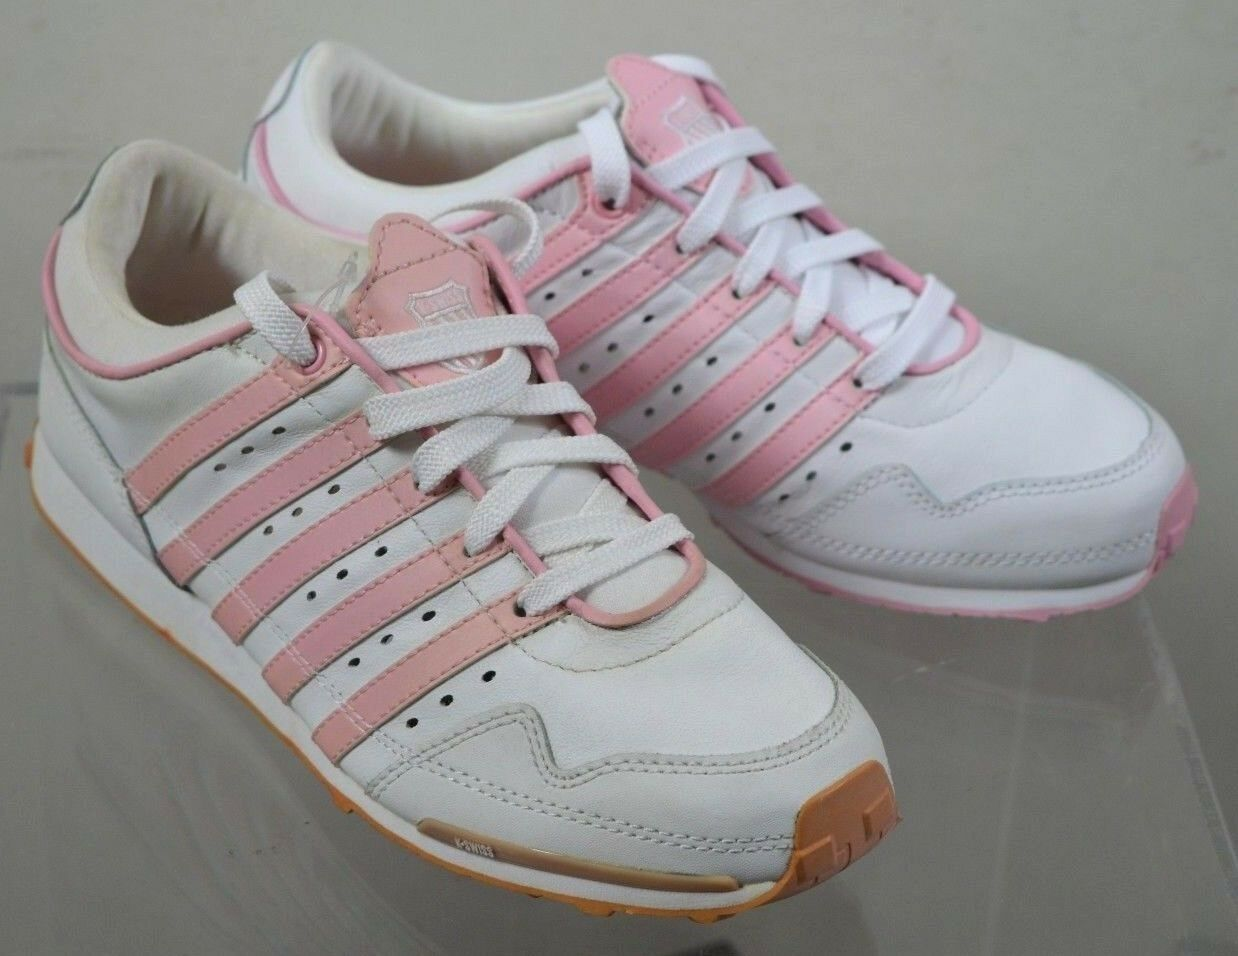 K-SWISS White Pink Gorzell Low UK Trainers Women's Size 4 UK Low 03444a